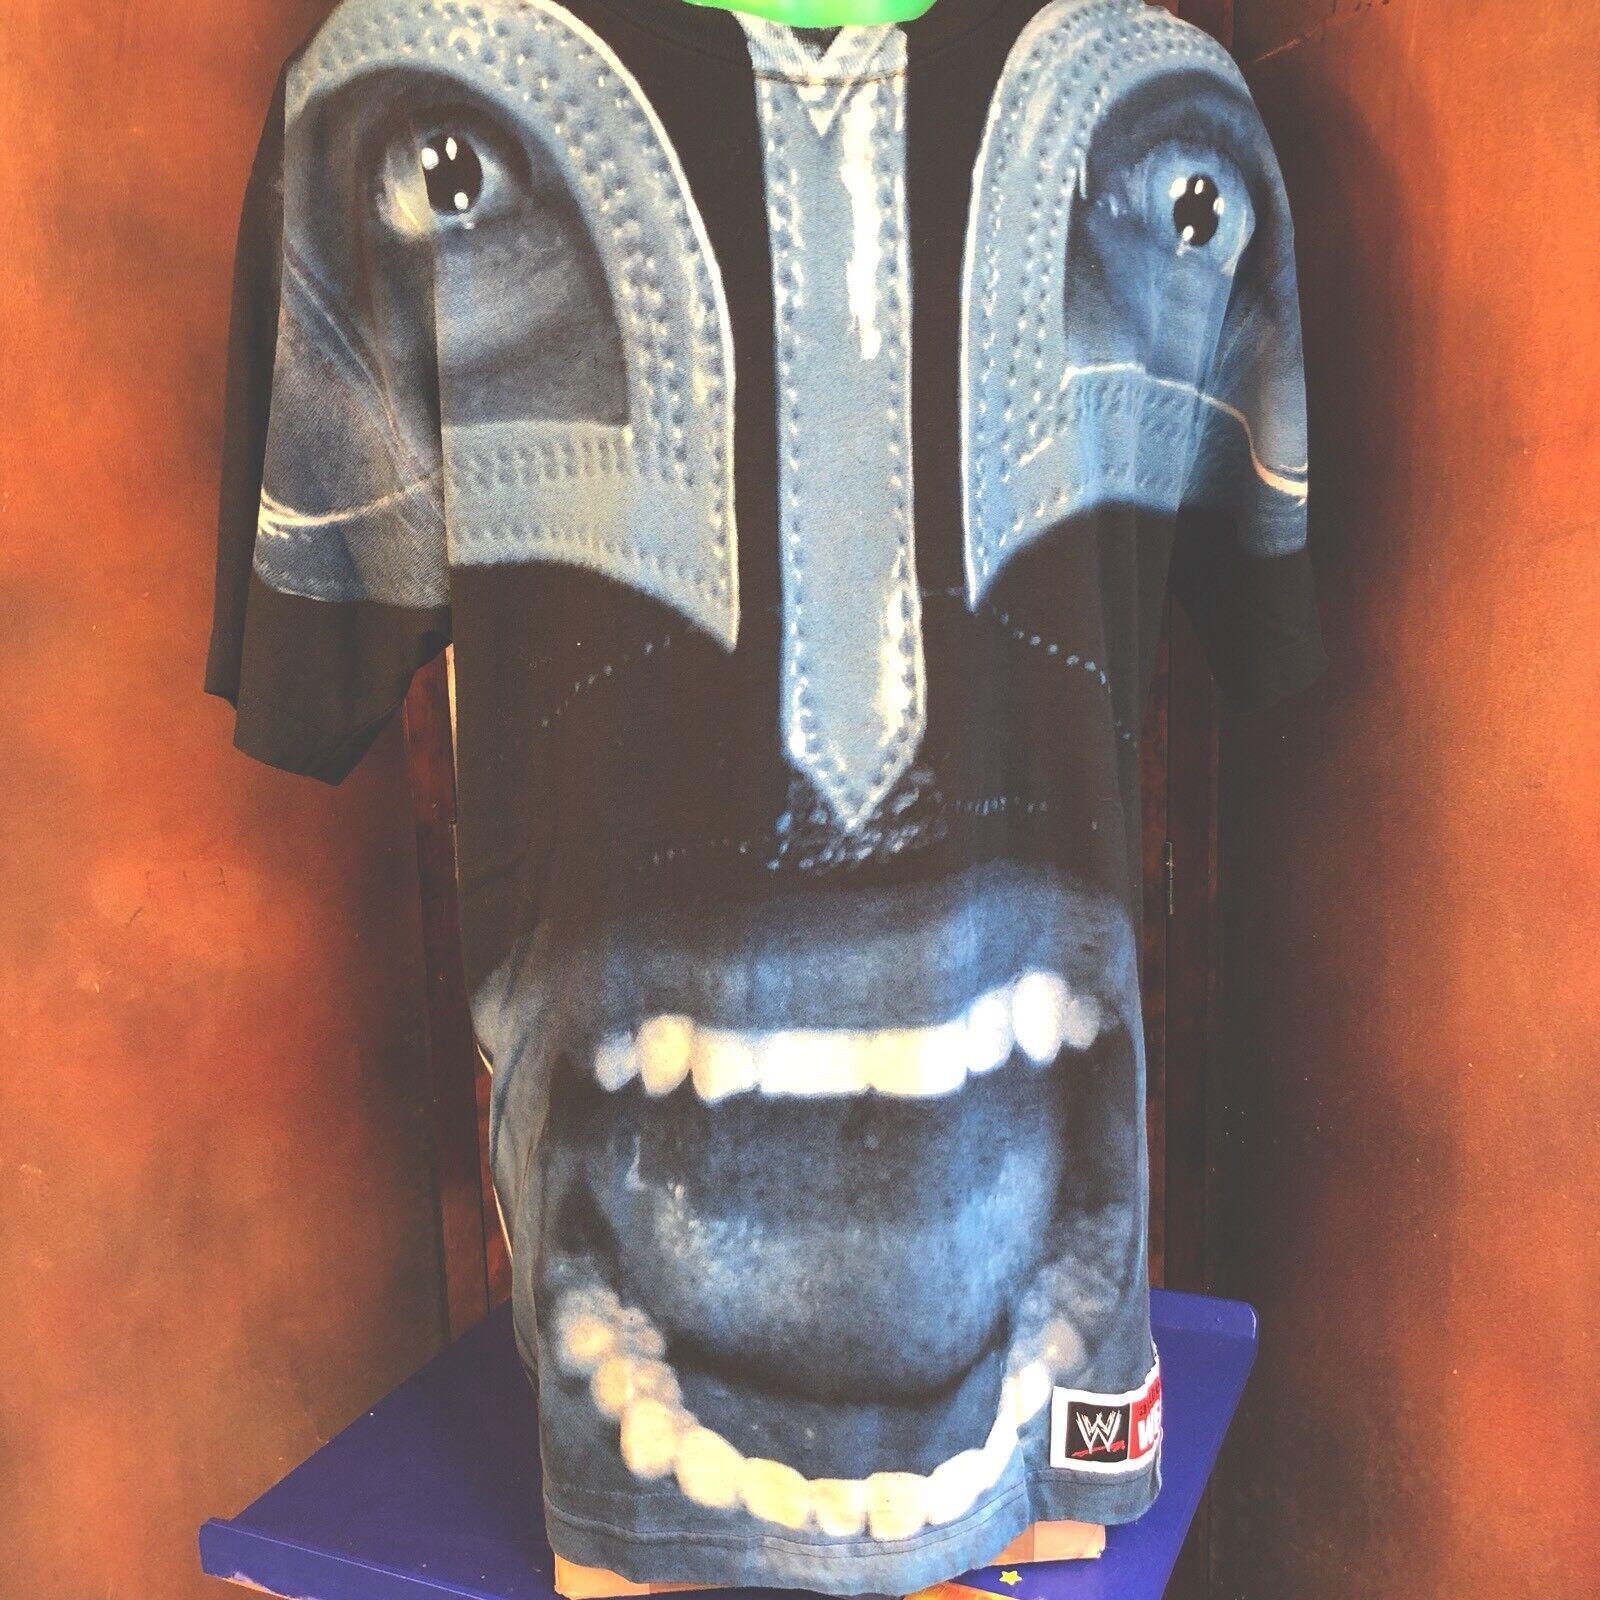 Rey Mysterio Wrestler WWF Blau Masked Face WrestlingTee Shirt Größe Large Wrestle